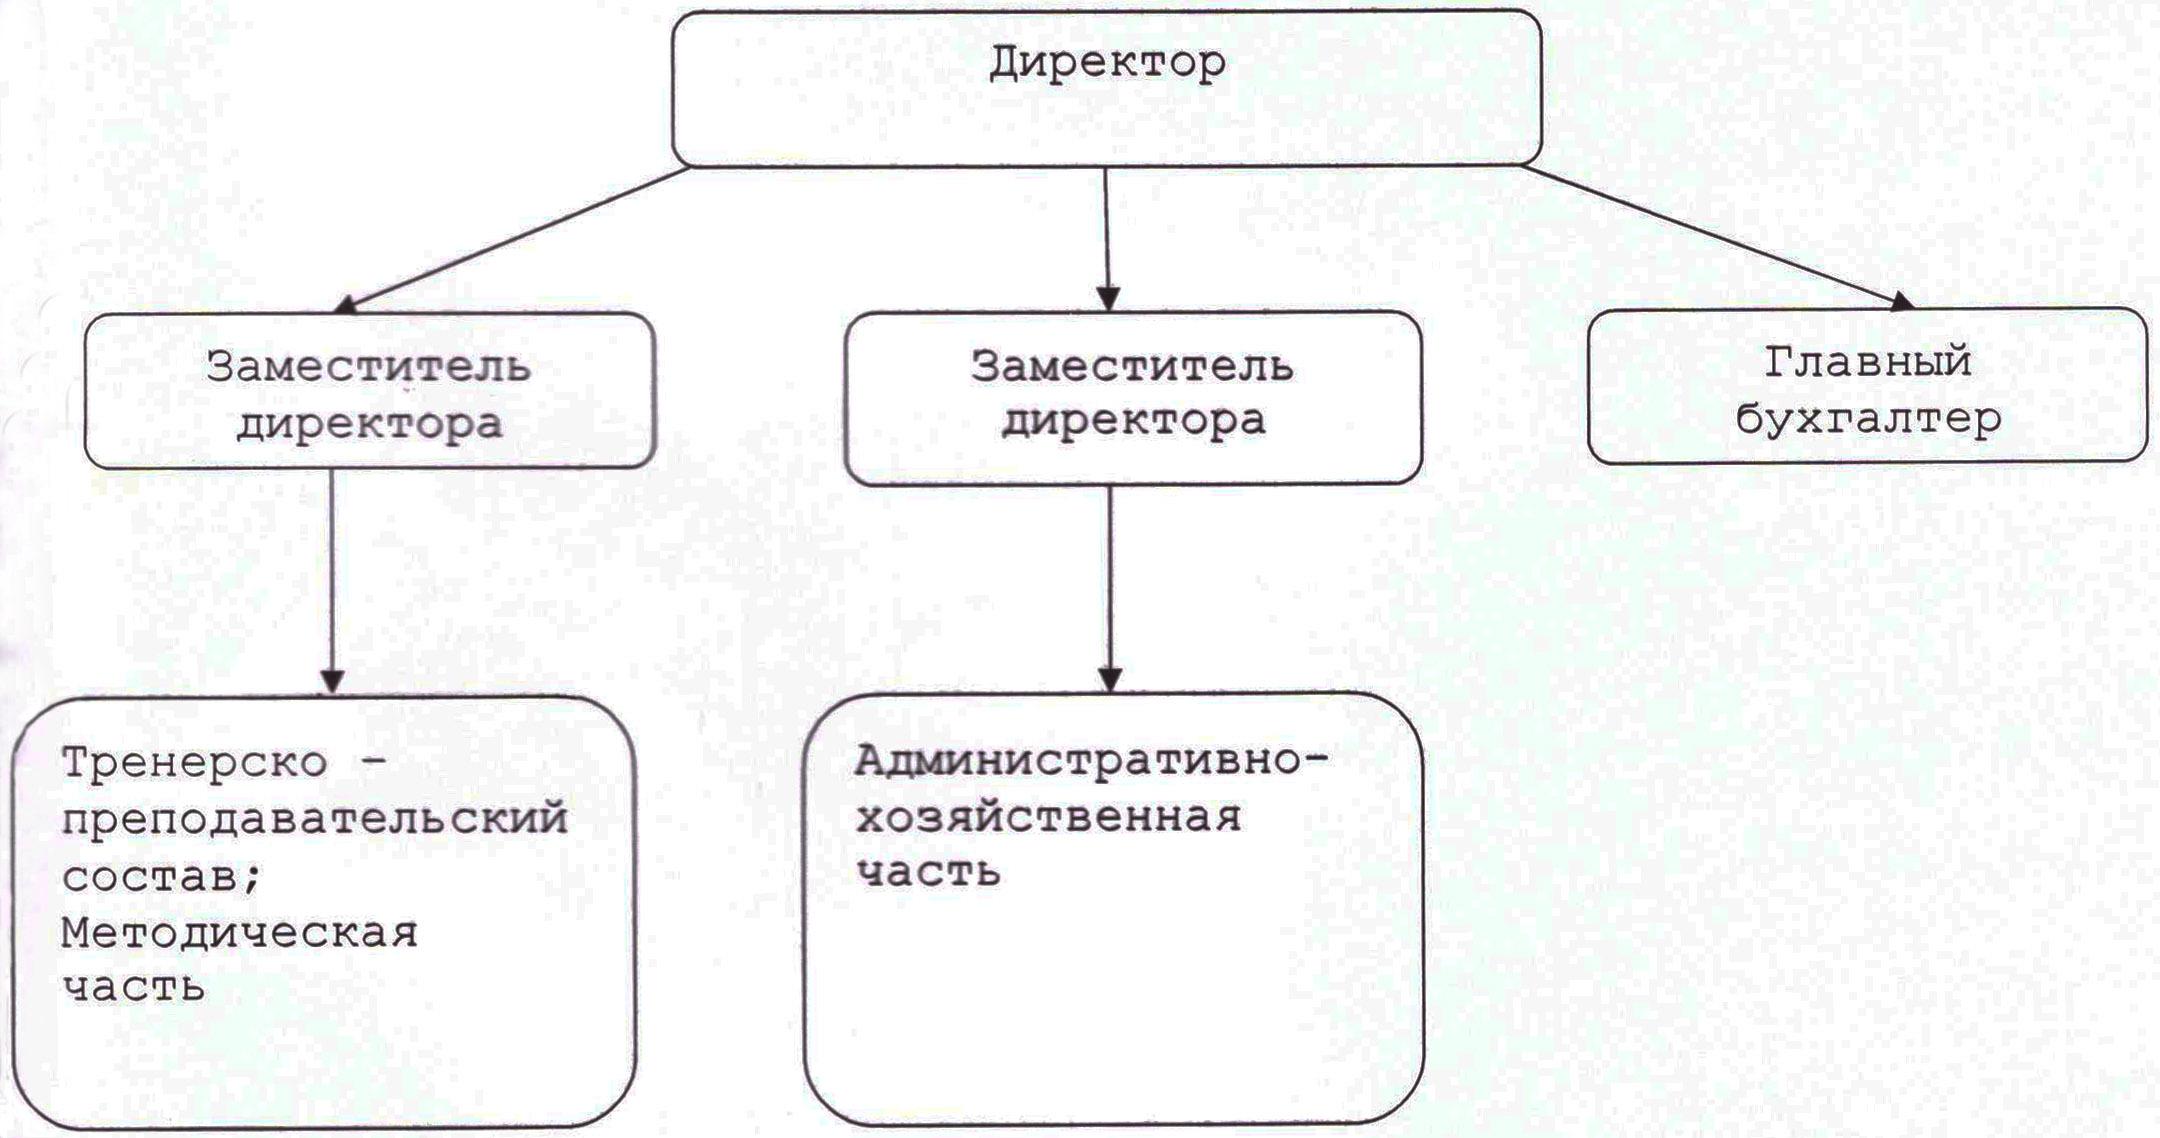 Структура